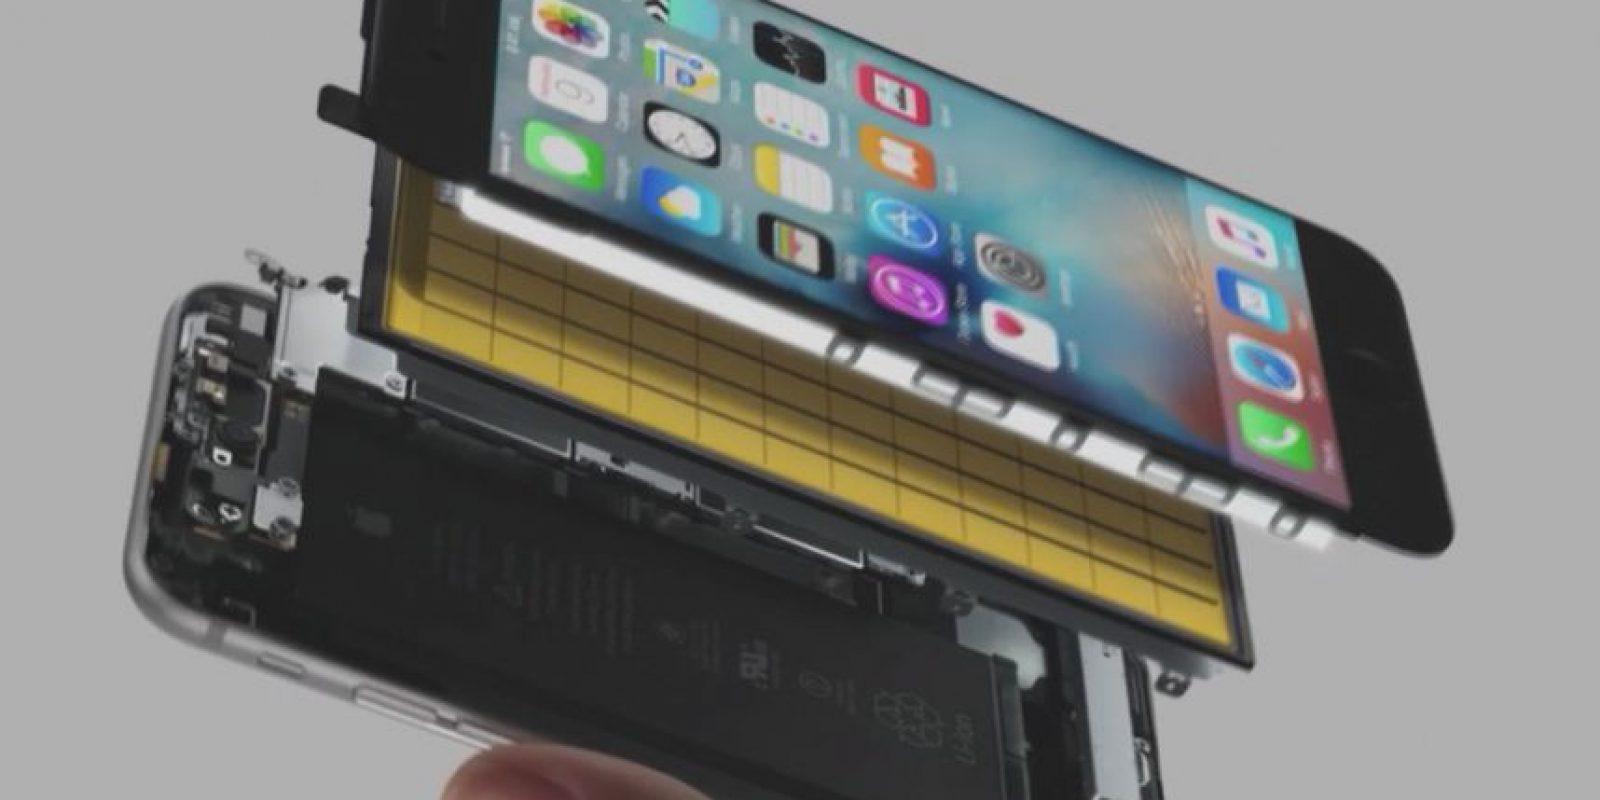 Tapic Engine, sensores capacitivos y 3D Touch Foto:Apple